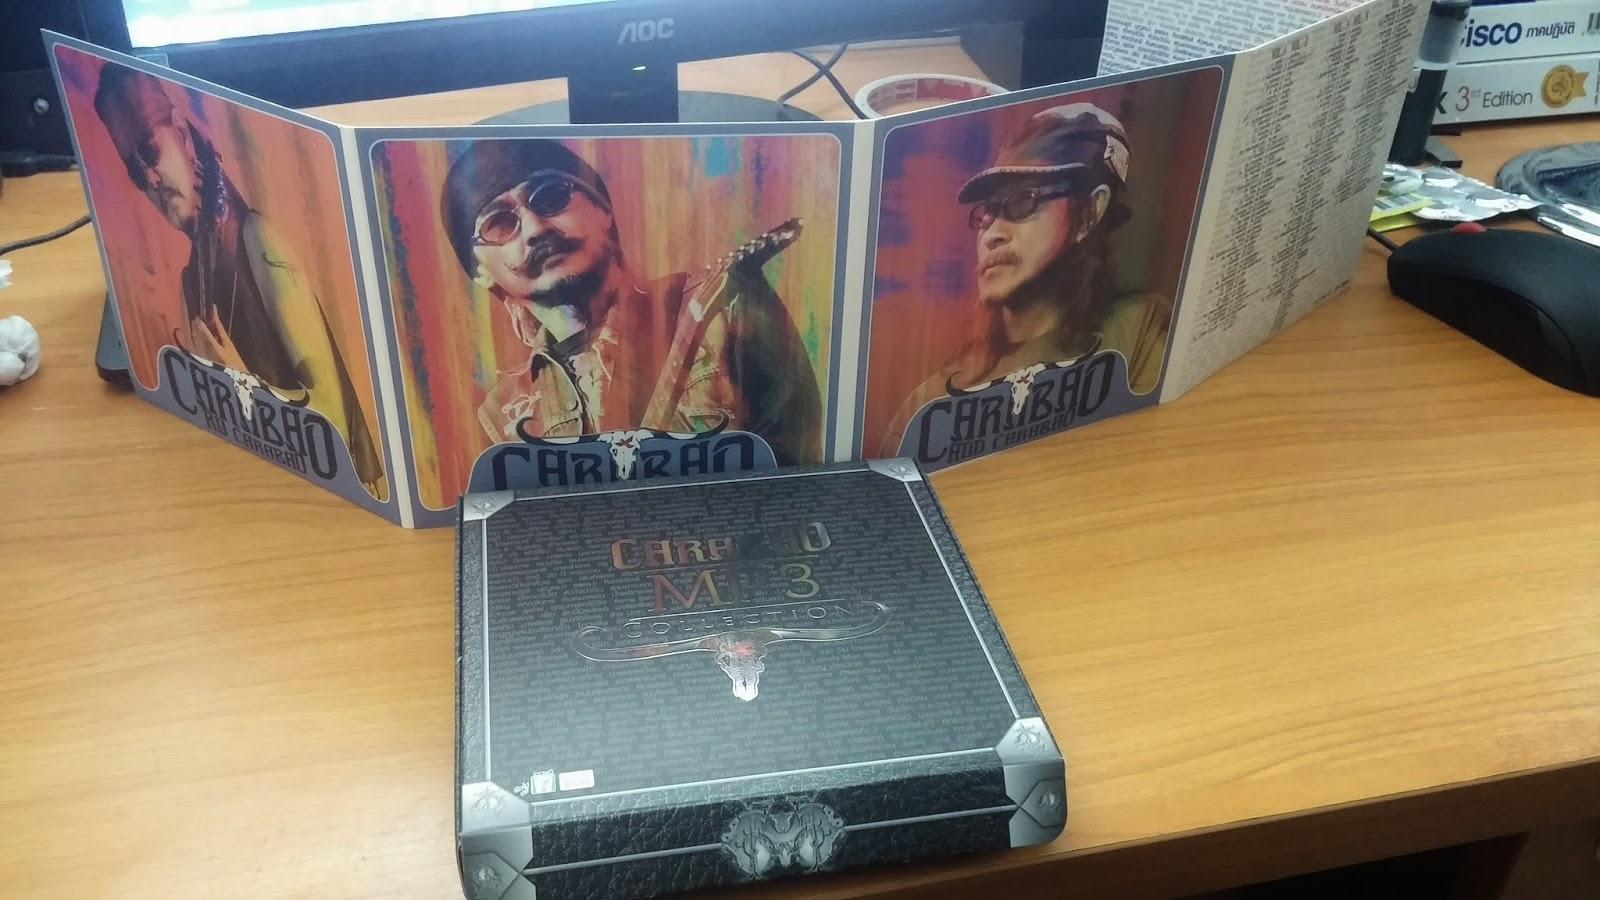 "Download [Mp3]-[Box Set] CARABAO MP3 COLLECTION รวบรวมผลงานเพลง 288 เพลง จาก 26 อัลบั้มของวงดนตรีหัวควายนาม ""คาราบาว"" @320kbps [Solidfiles] 4shared By Pleng-mun.com"